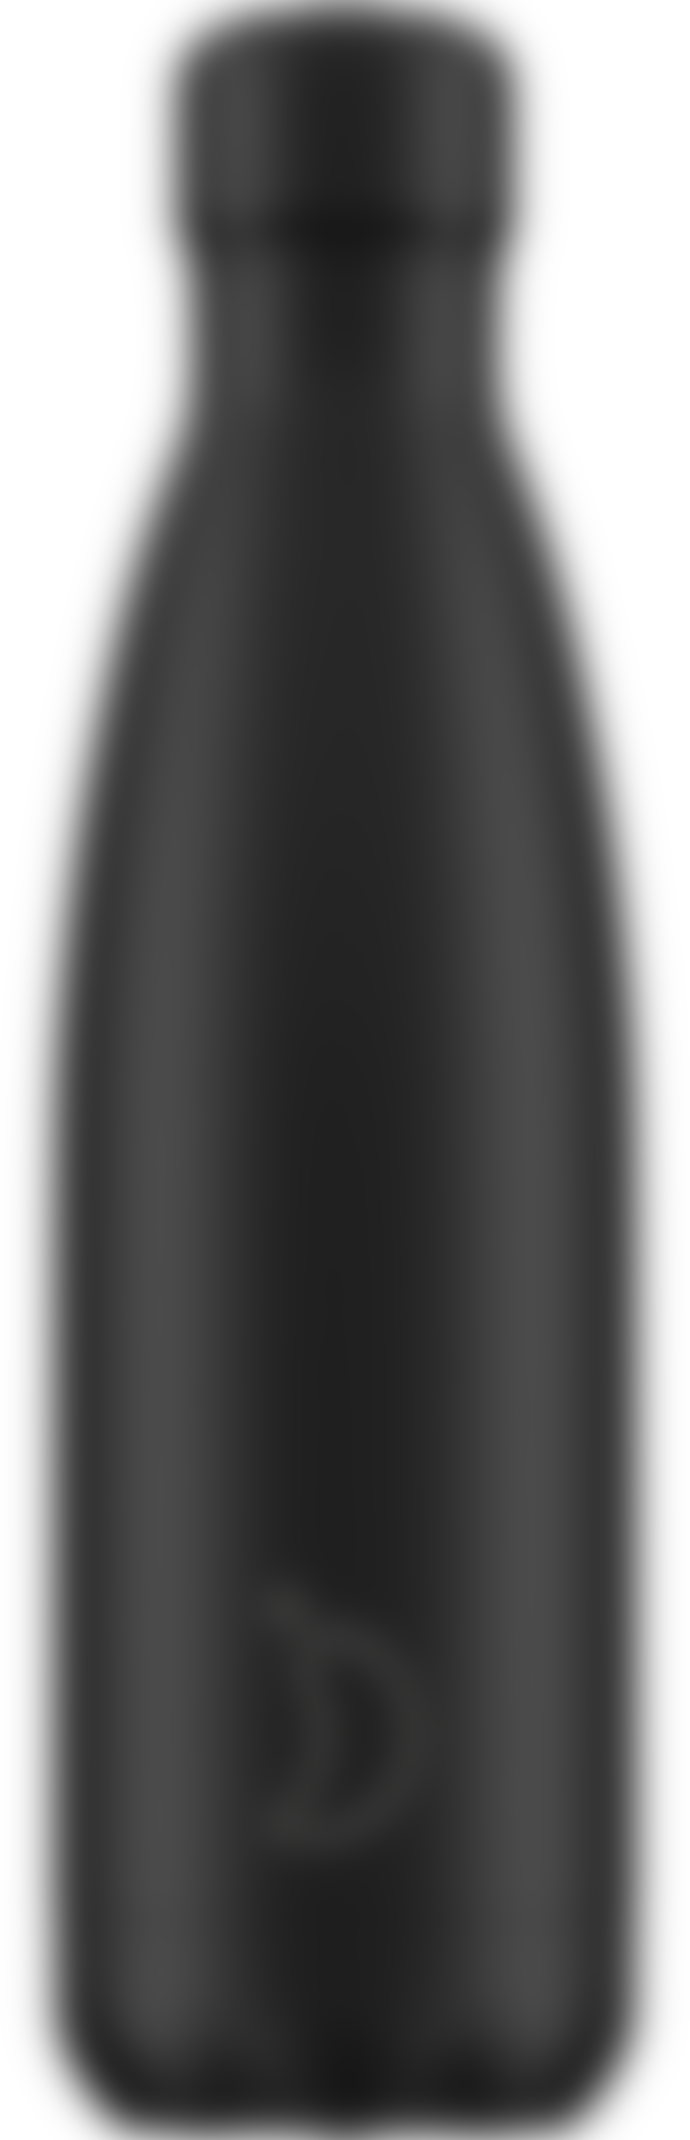 Chilly's Bottles 0.5 l Mono All Black Clima Bottle